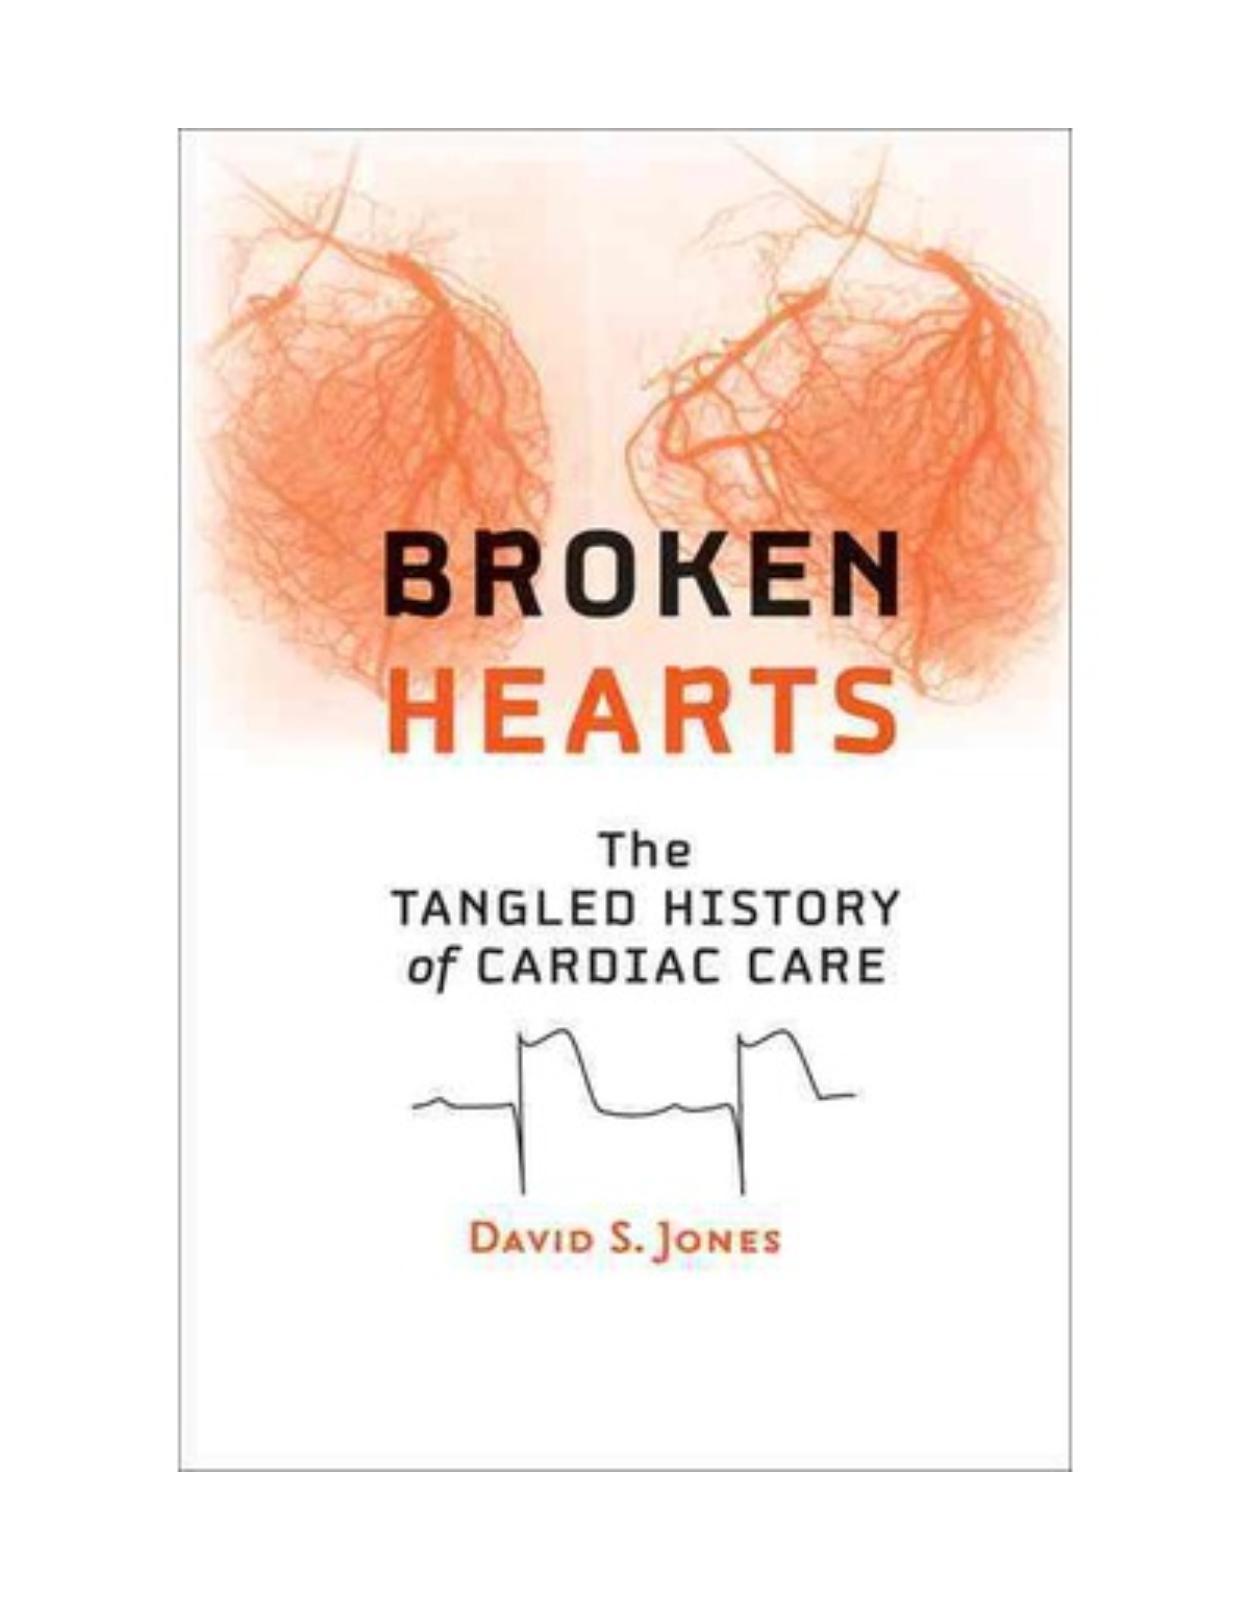 Broken Hearts. The Tangled History of Cardiac Care